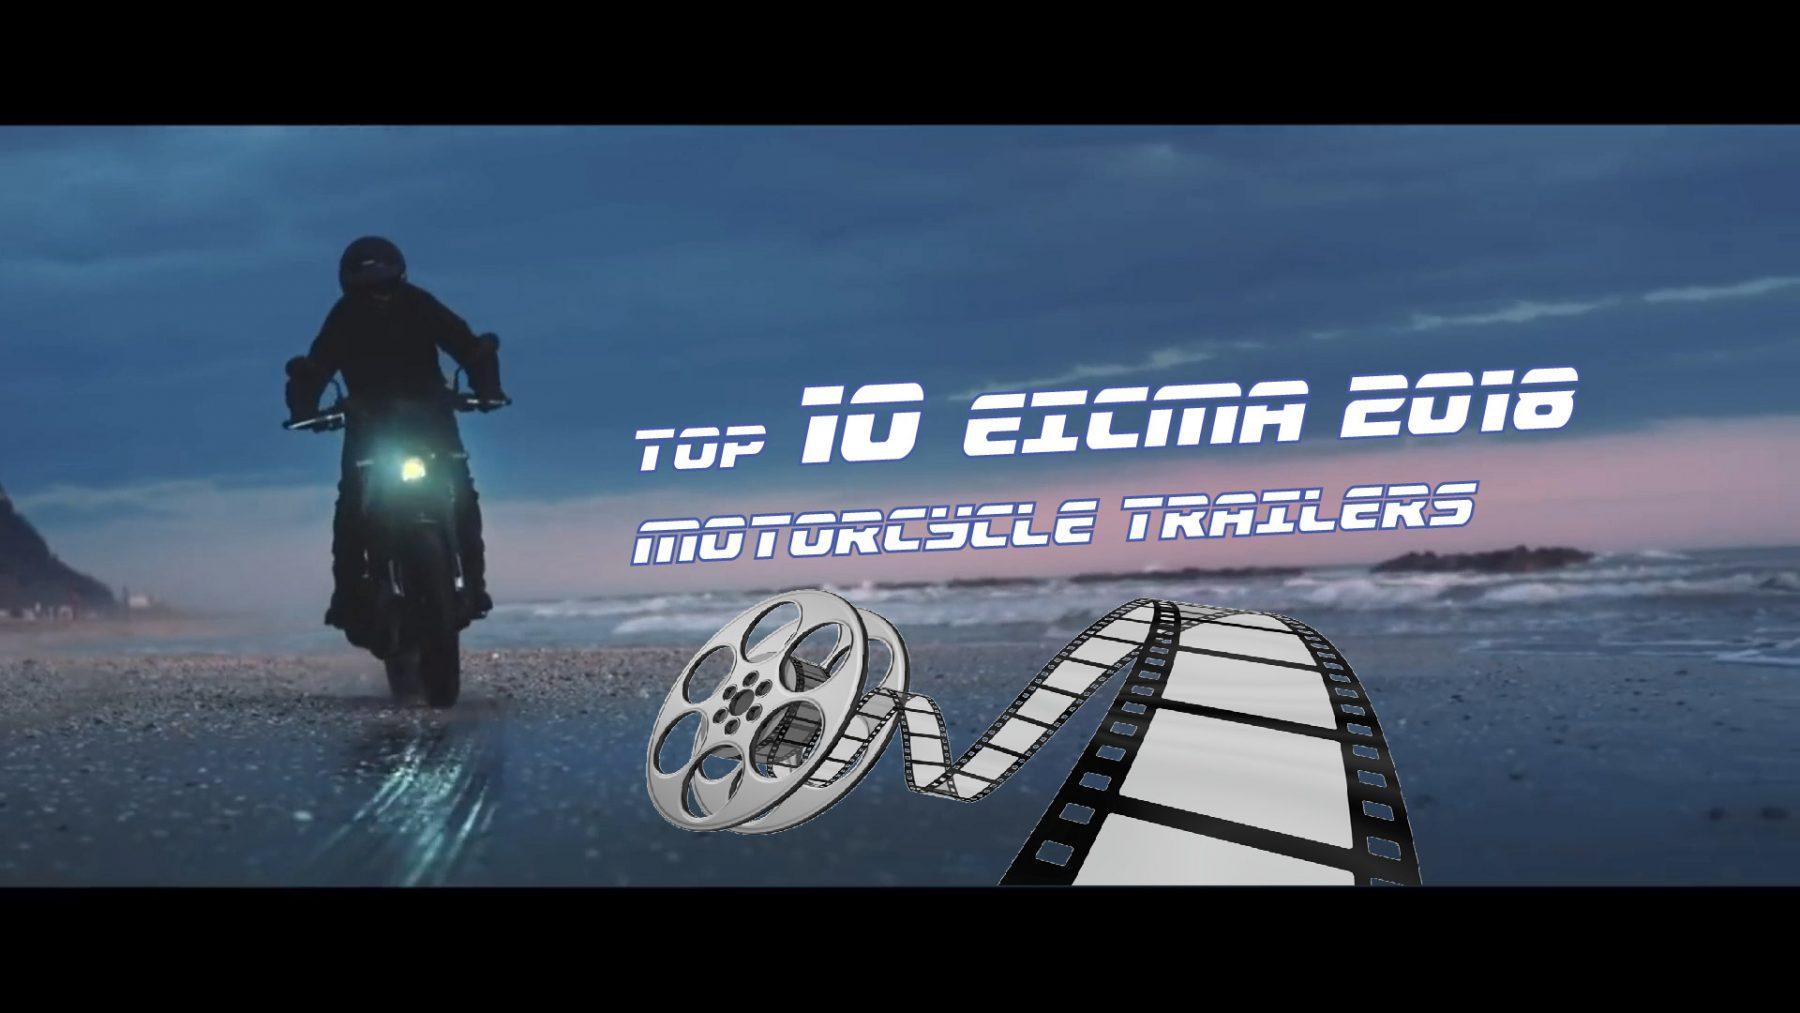 Toп 10 мото трейлъри от EICMA 2018